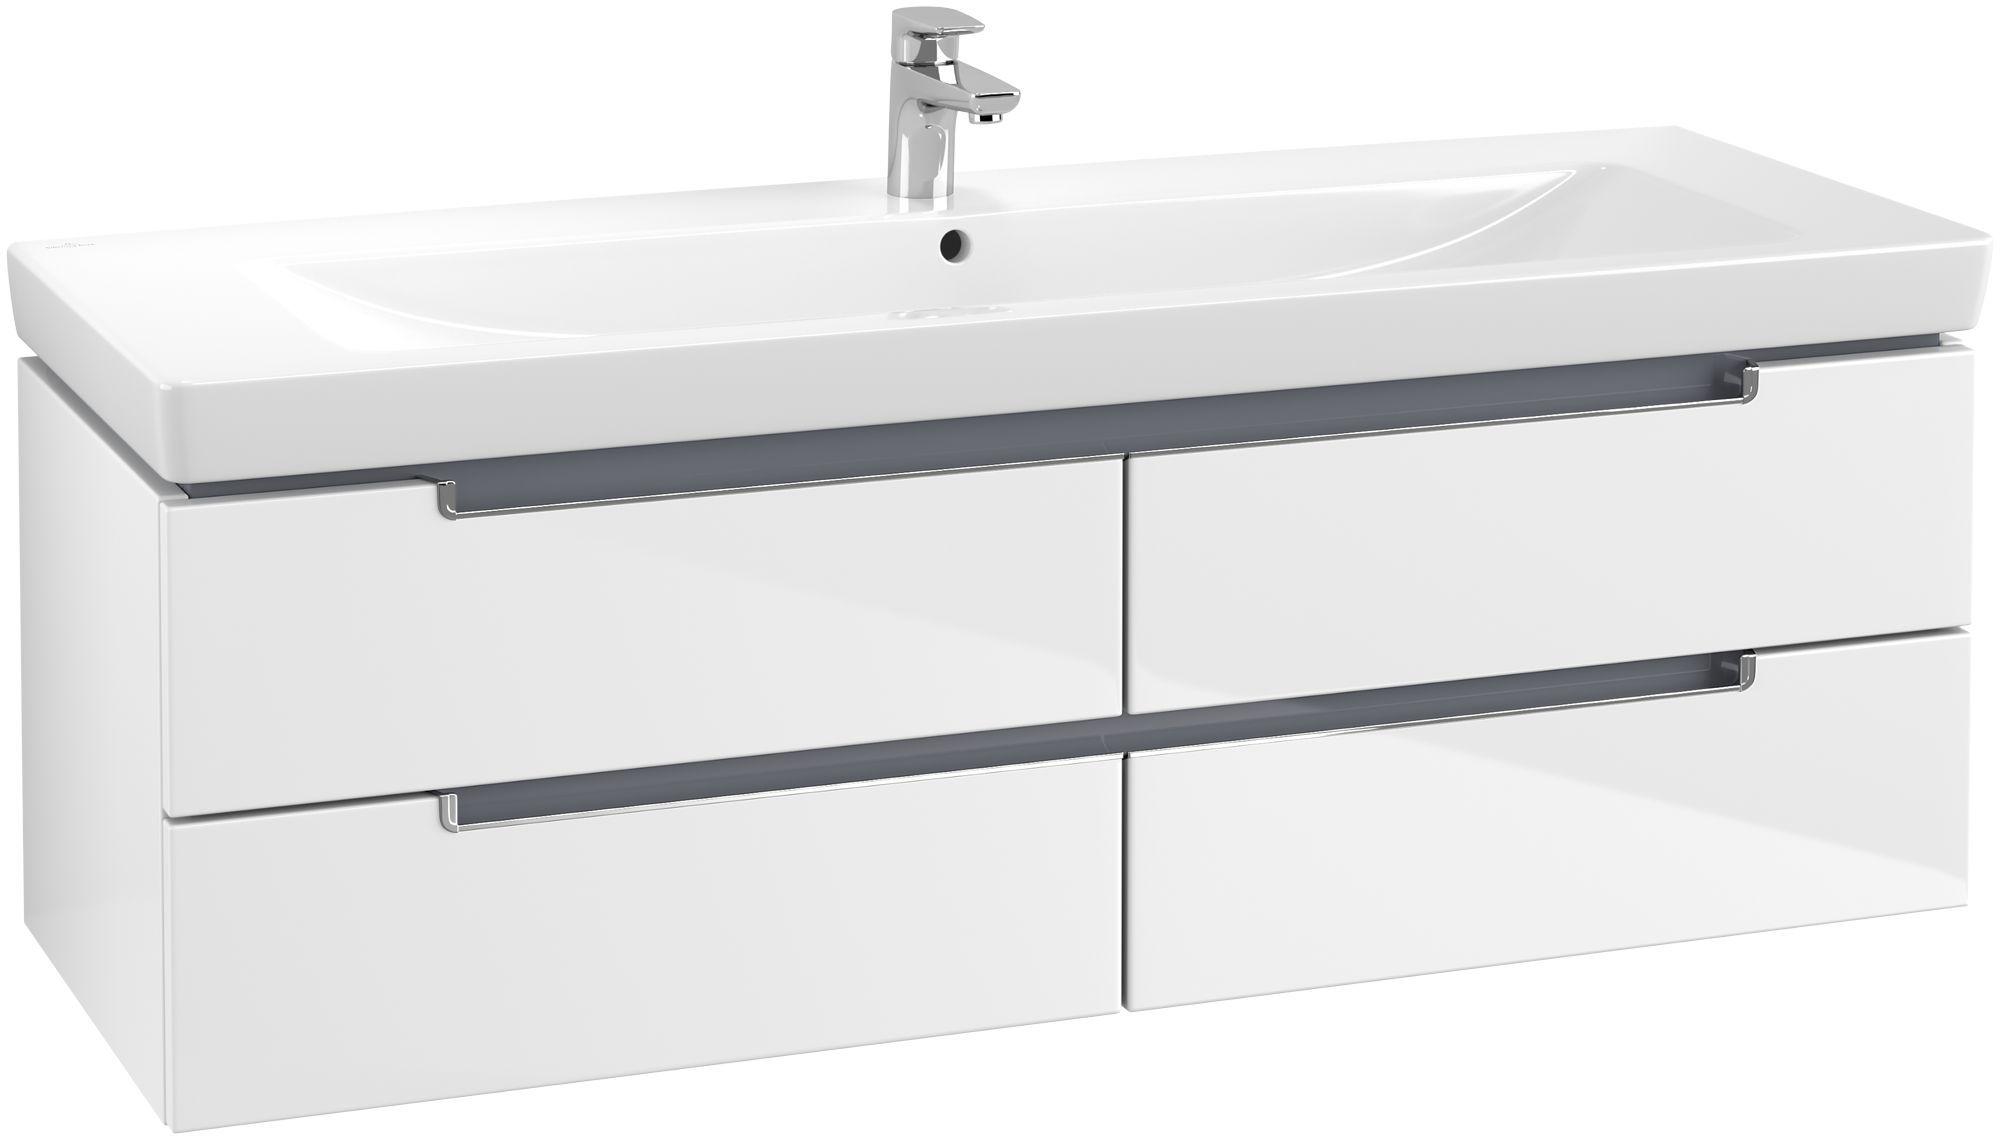 Villeroy & Boch Subway 2.0 Waschtischunterschrank 4 Auszüge B:1287xT:449xH:420mm glossy weiß Griffe chrom A69110DH